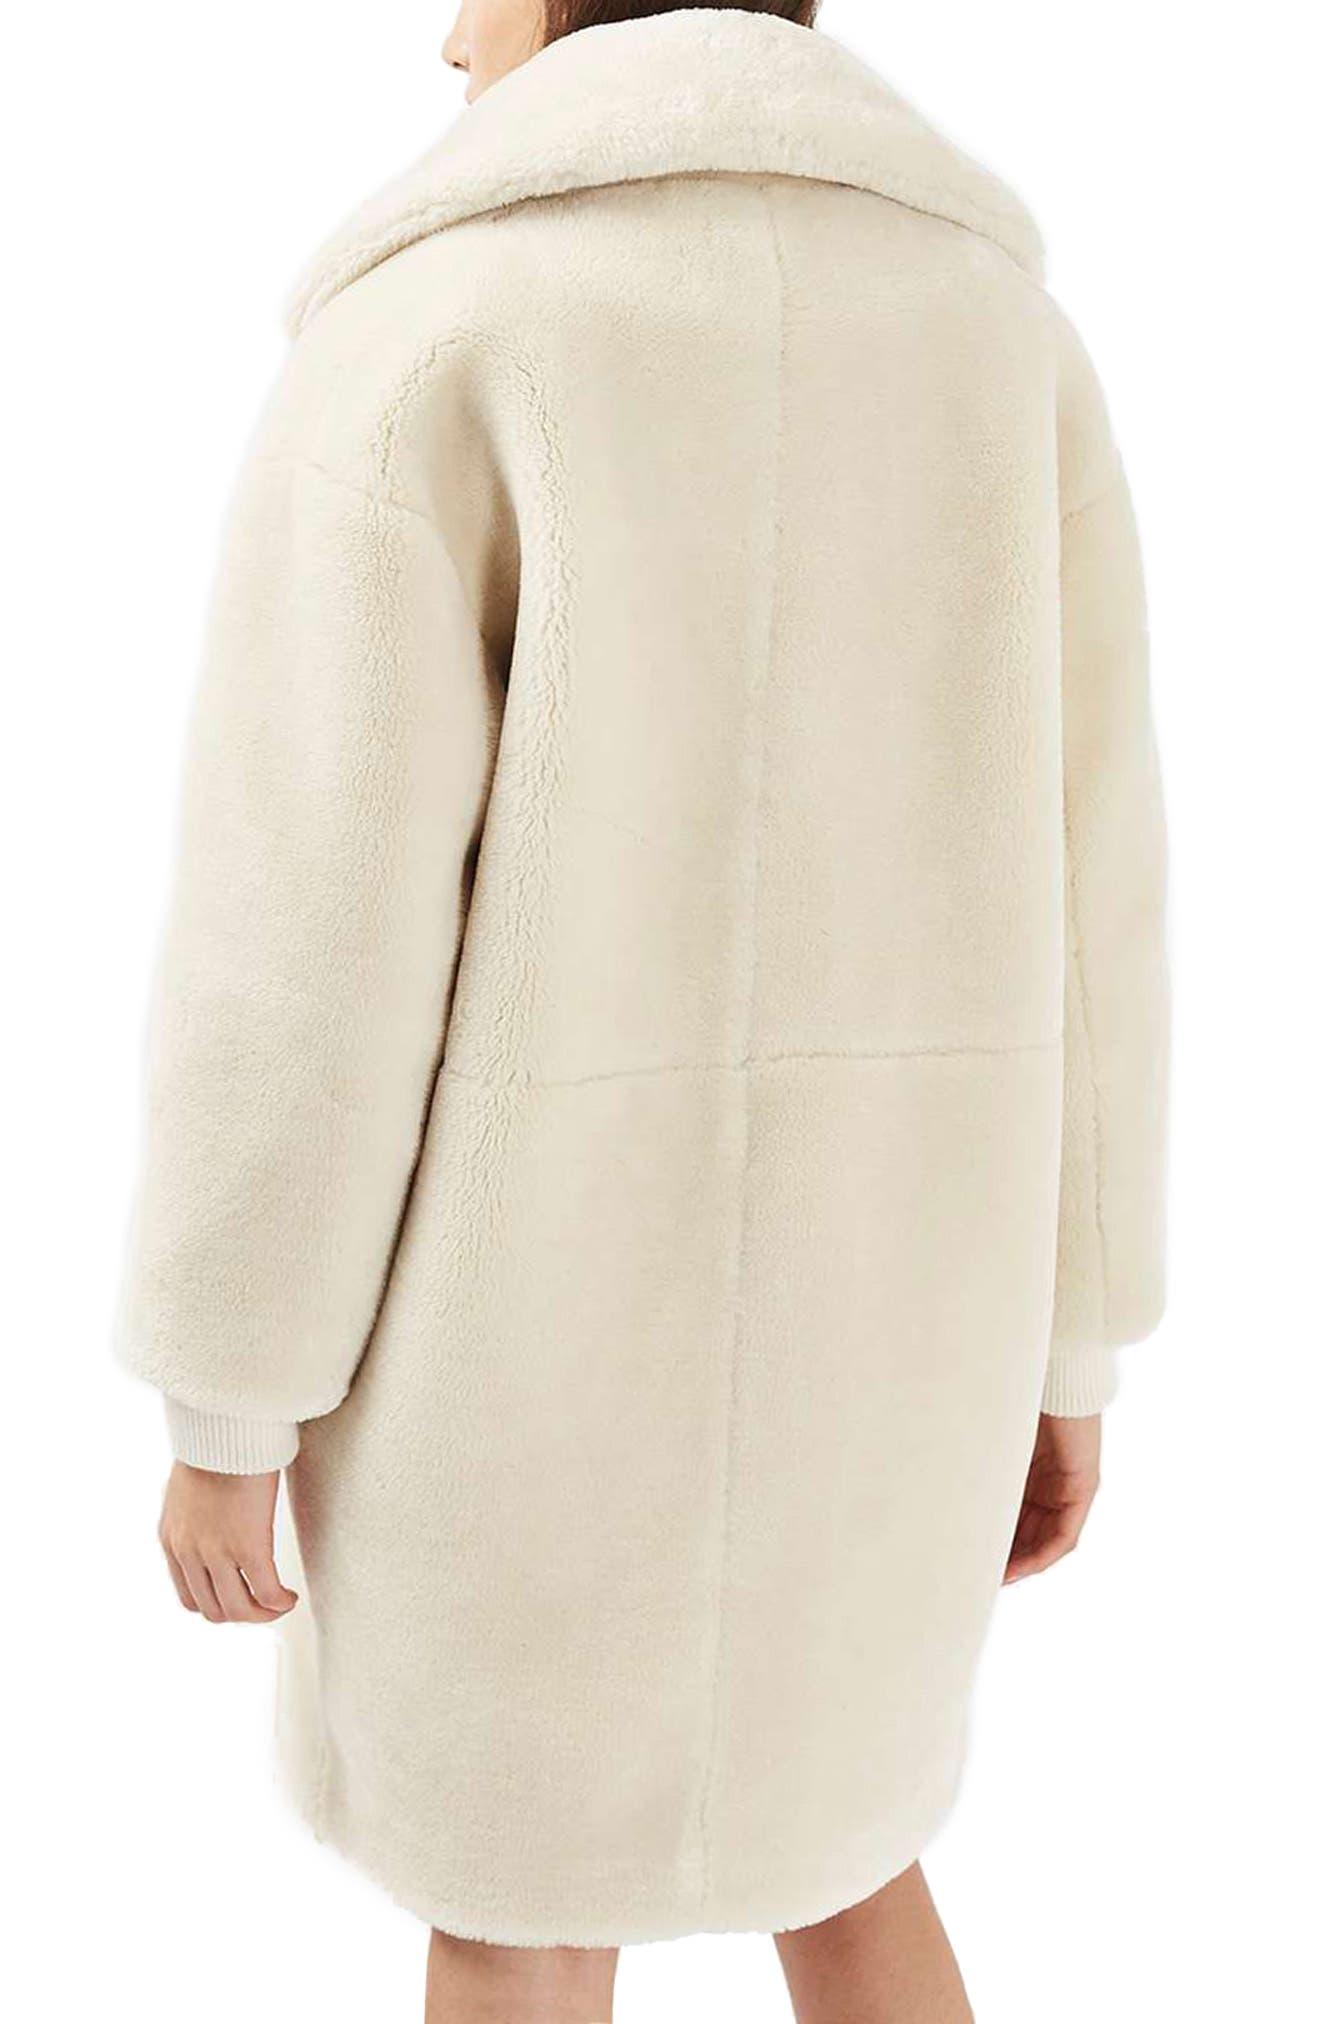 TOPSHOP,                             Polar Bear Faux Fur Coat,                             Alternate thumbnail 2, color,                             900